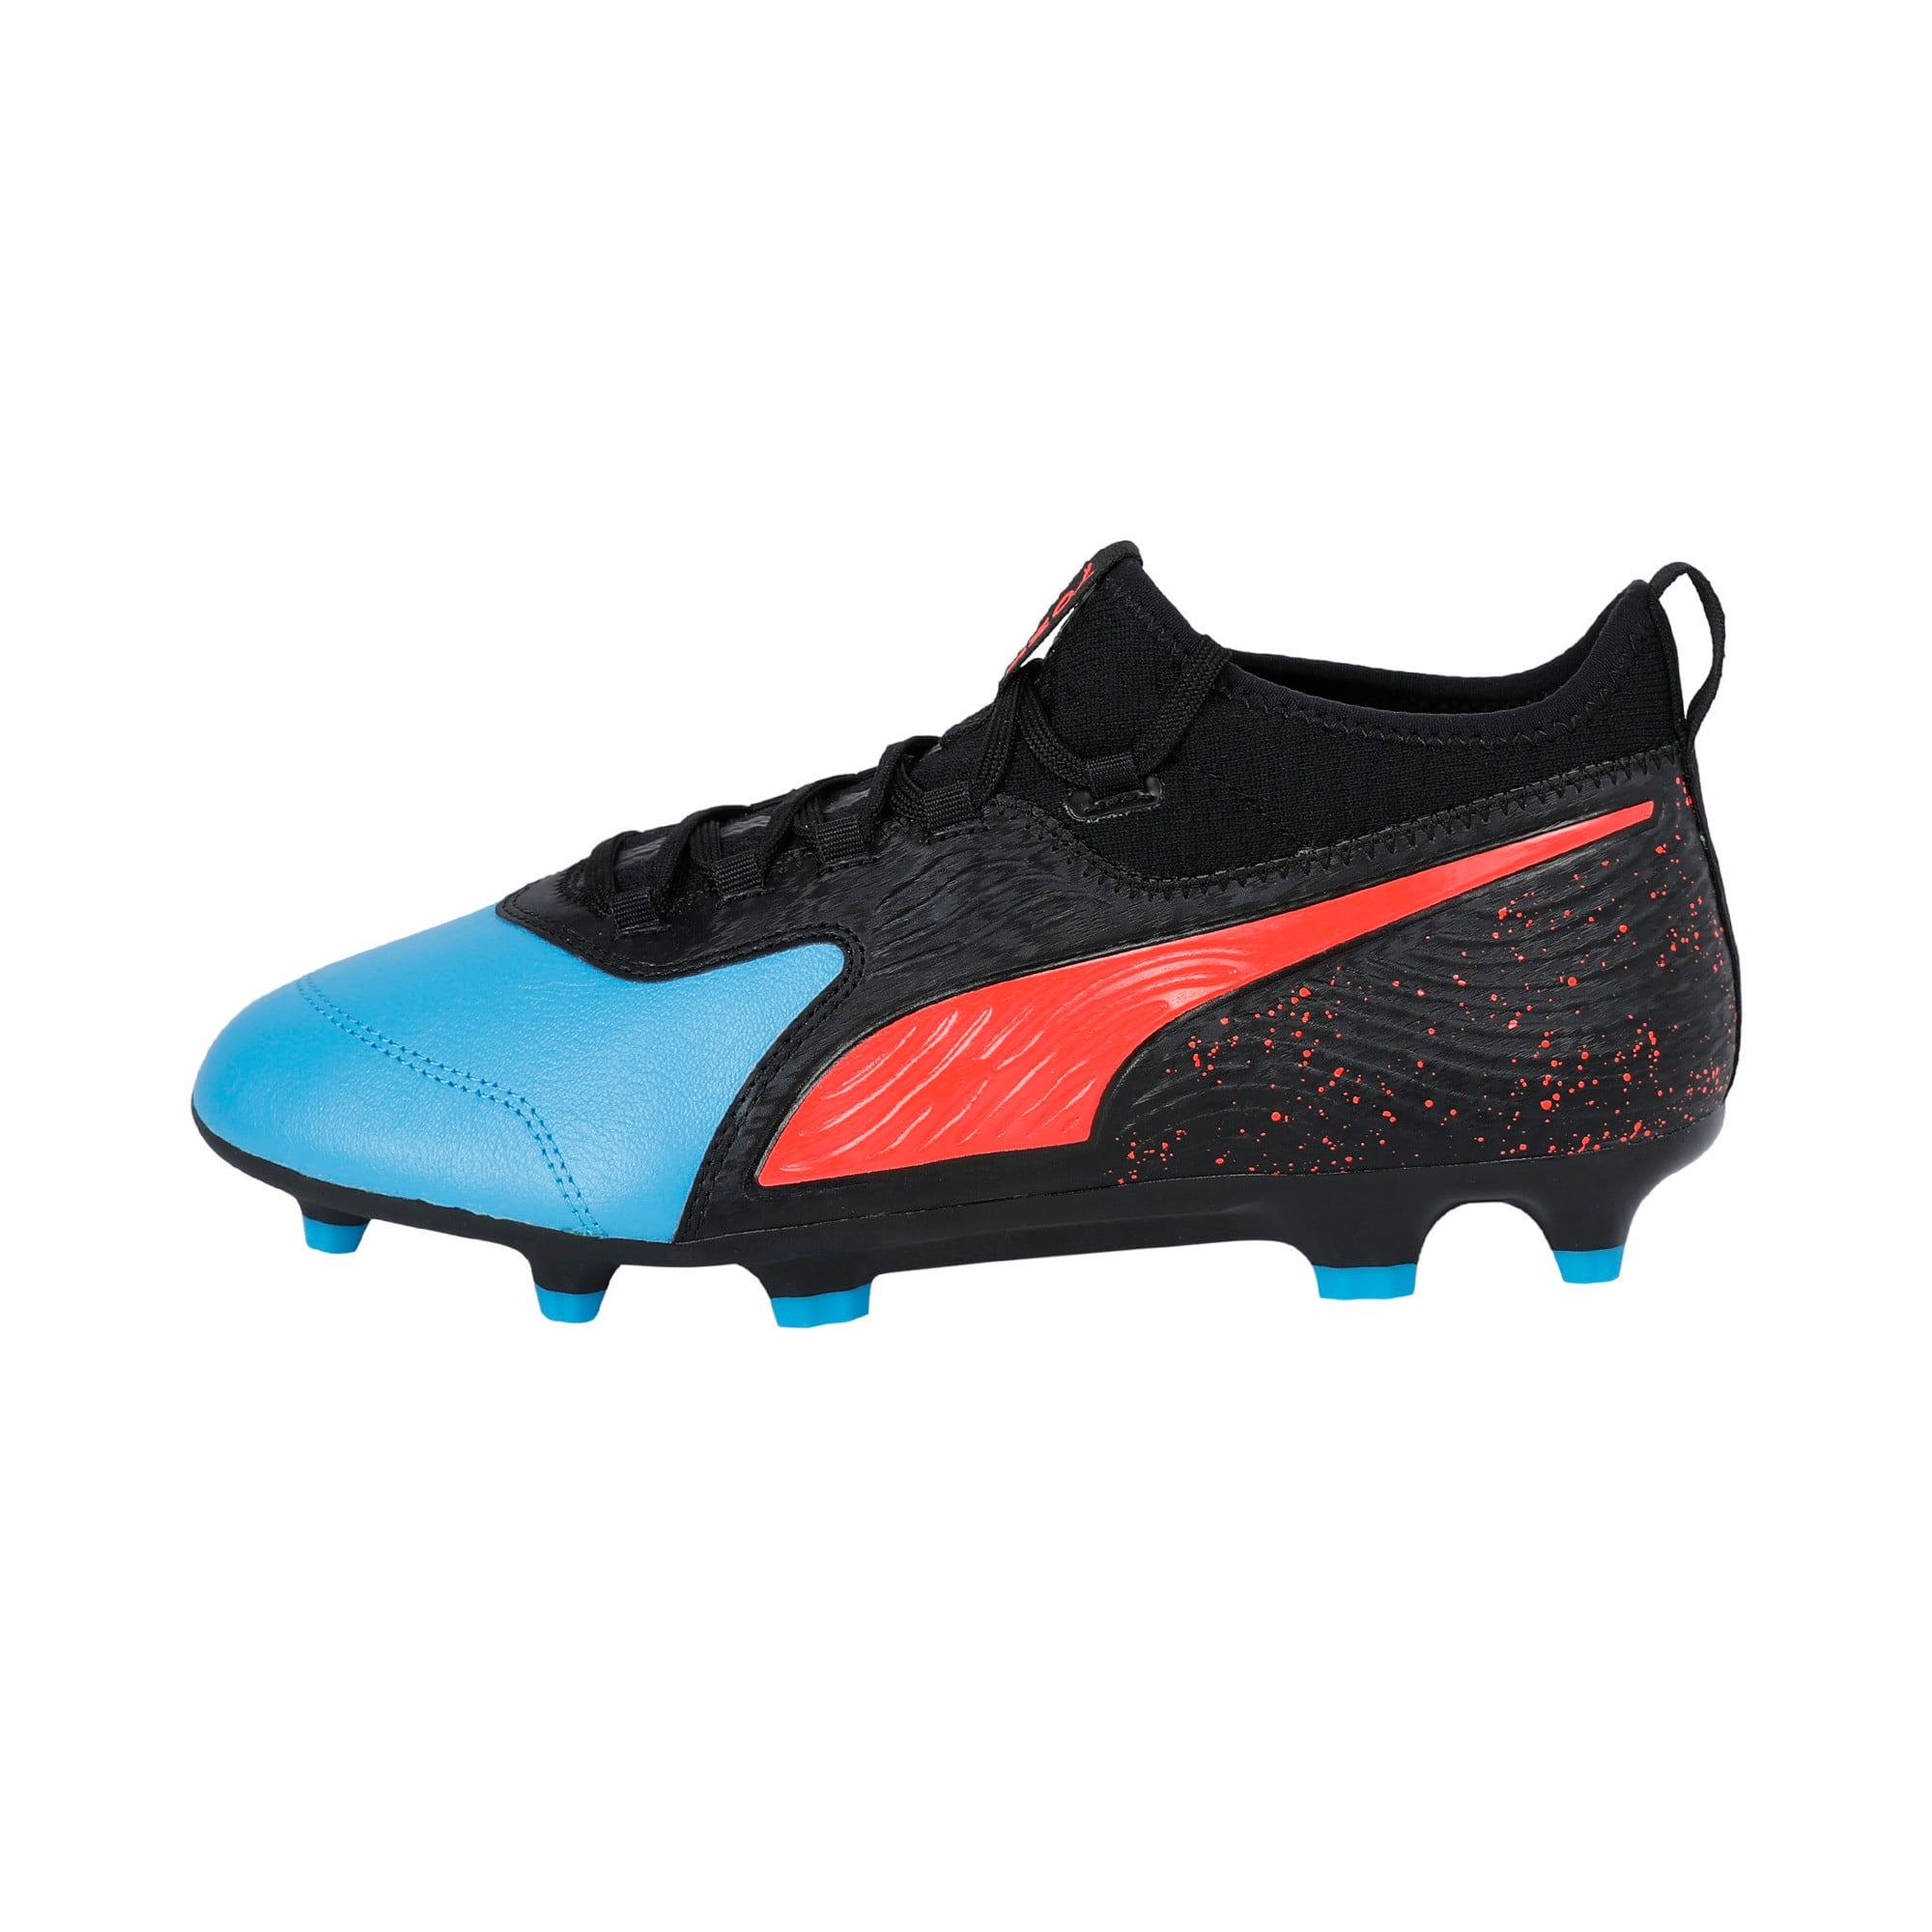 Thumbnail 1 of PUMA ONE 19.3 FG/AG Men's Football Boots, Bleu Azur-Red Blast-Black, medium-IND